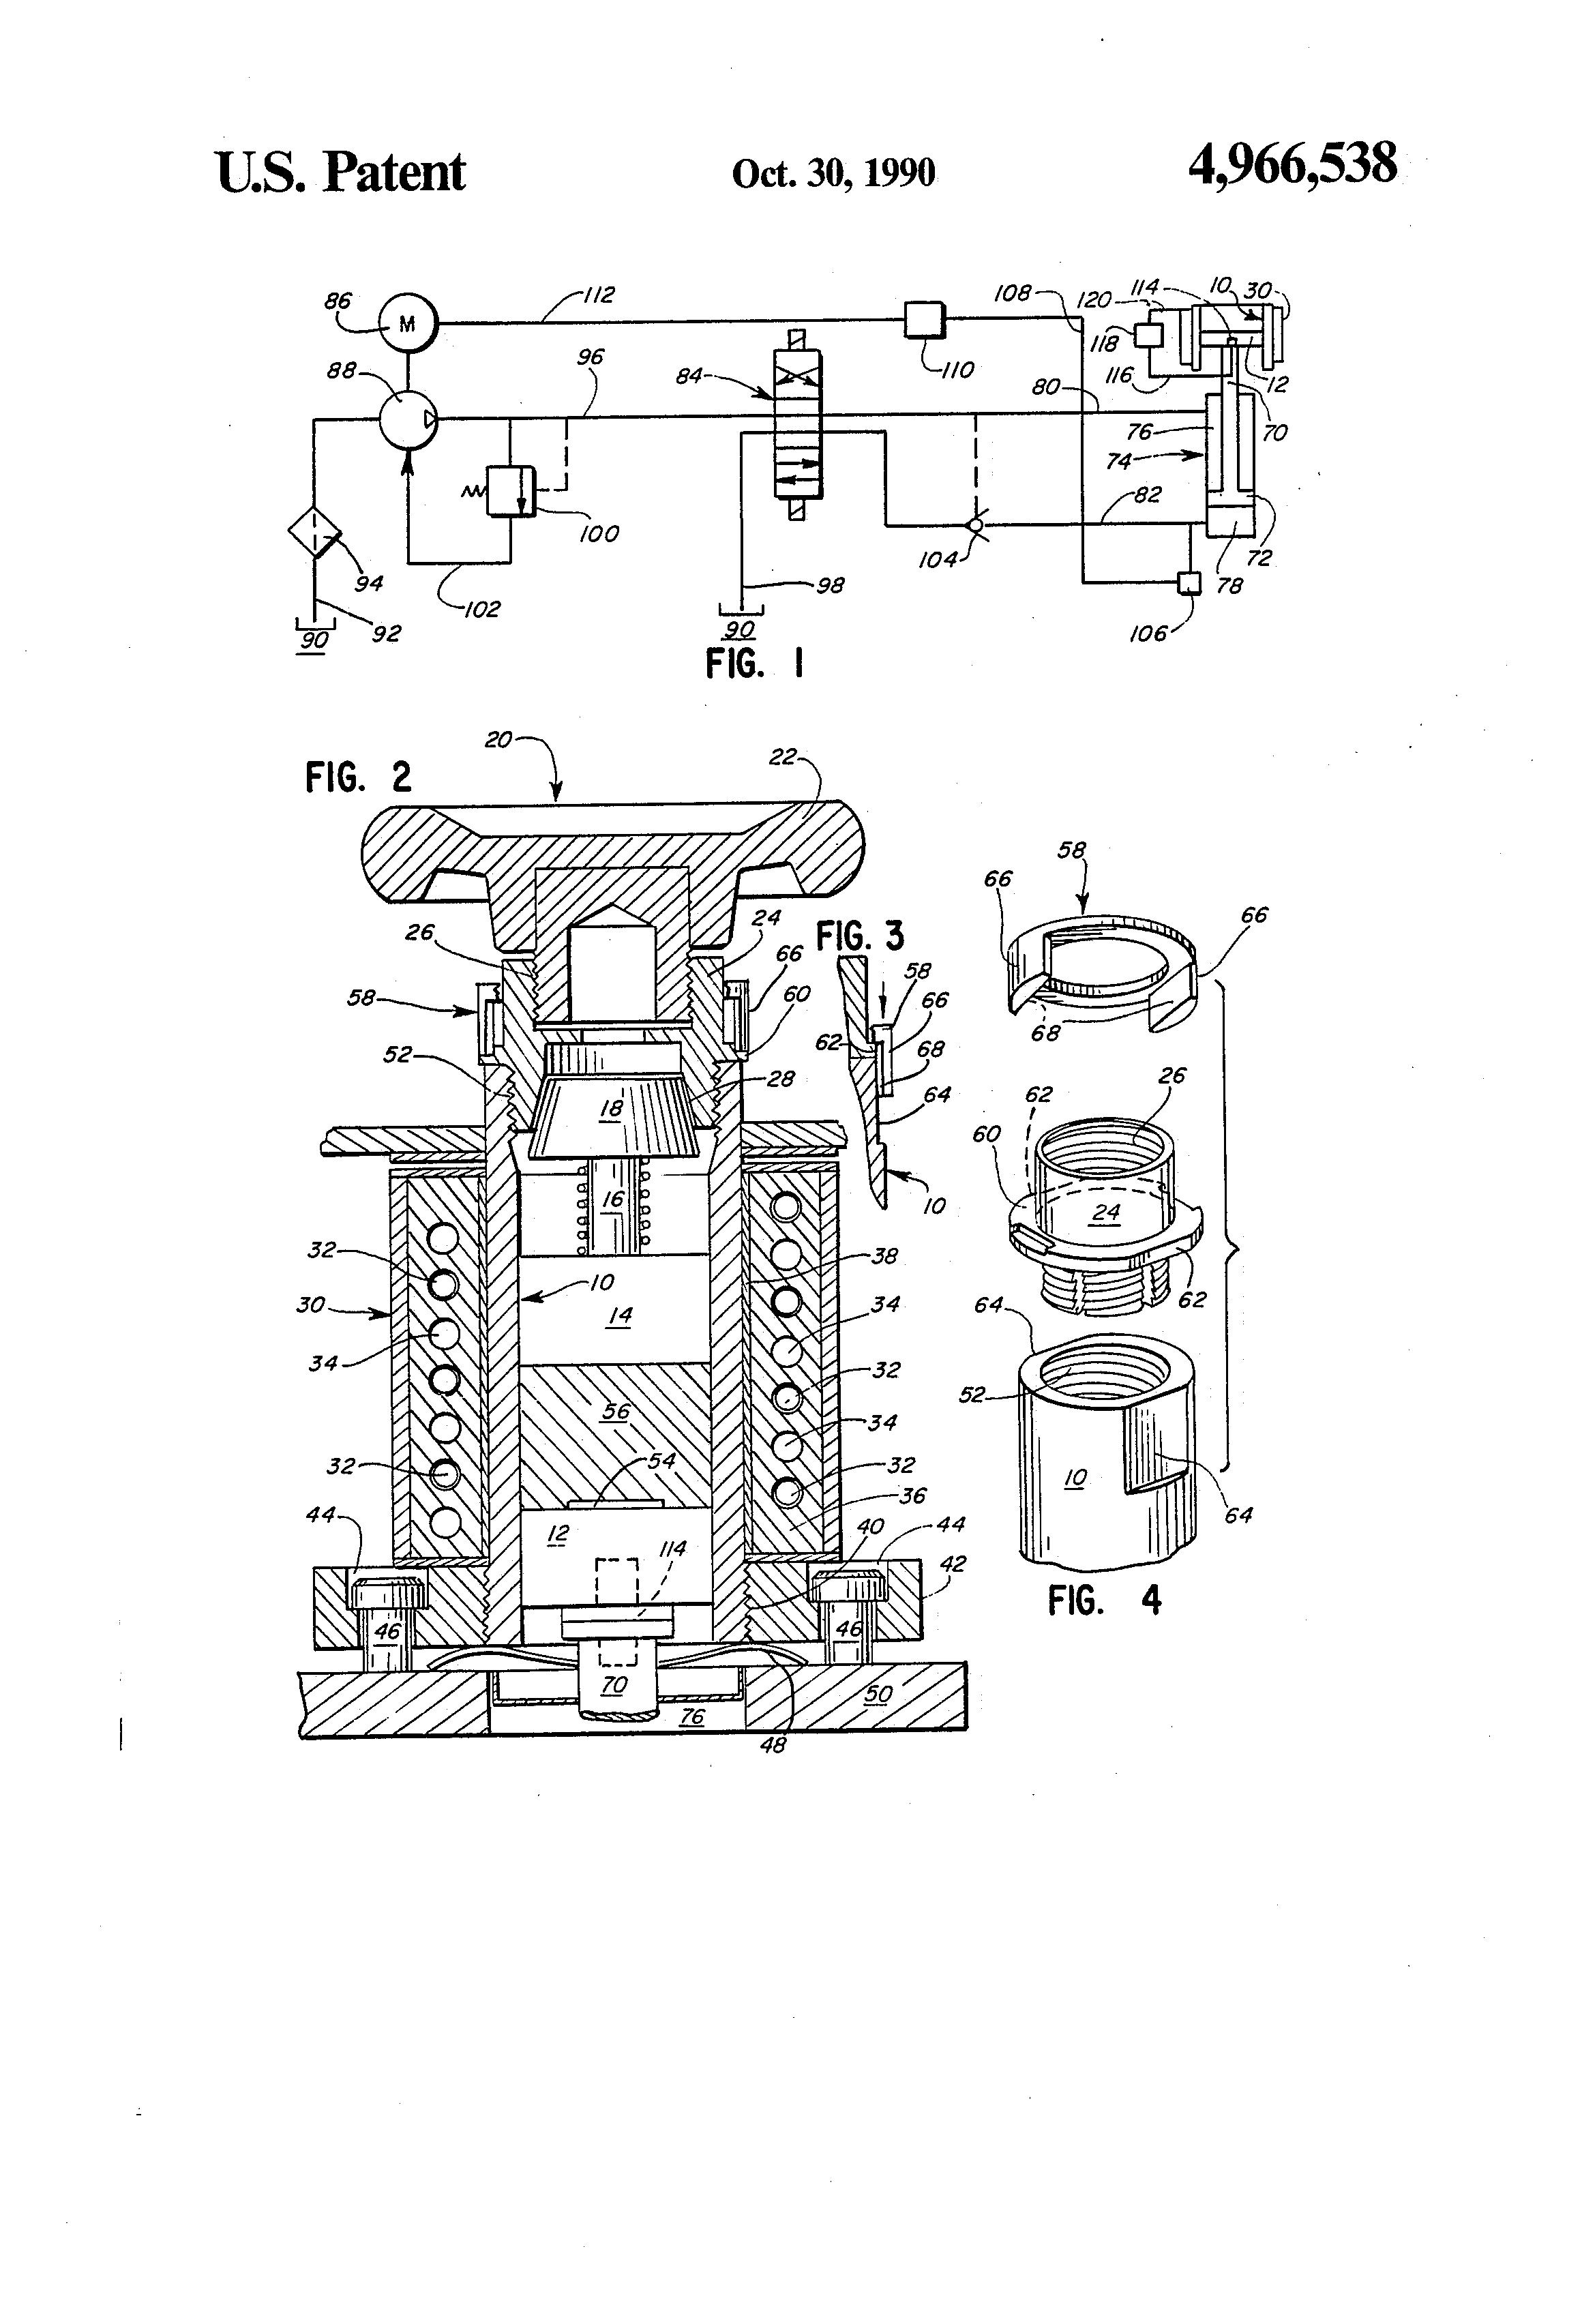 Burner Wiring Diagram Thermistor Electrical Diagrams Basic Guide U2022